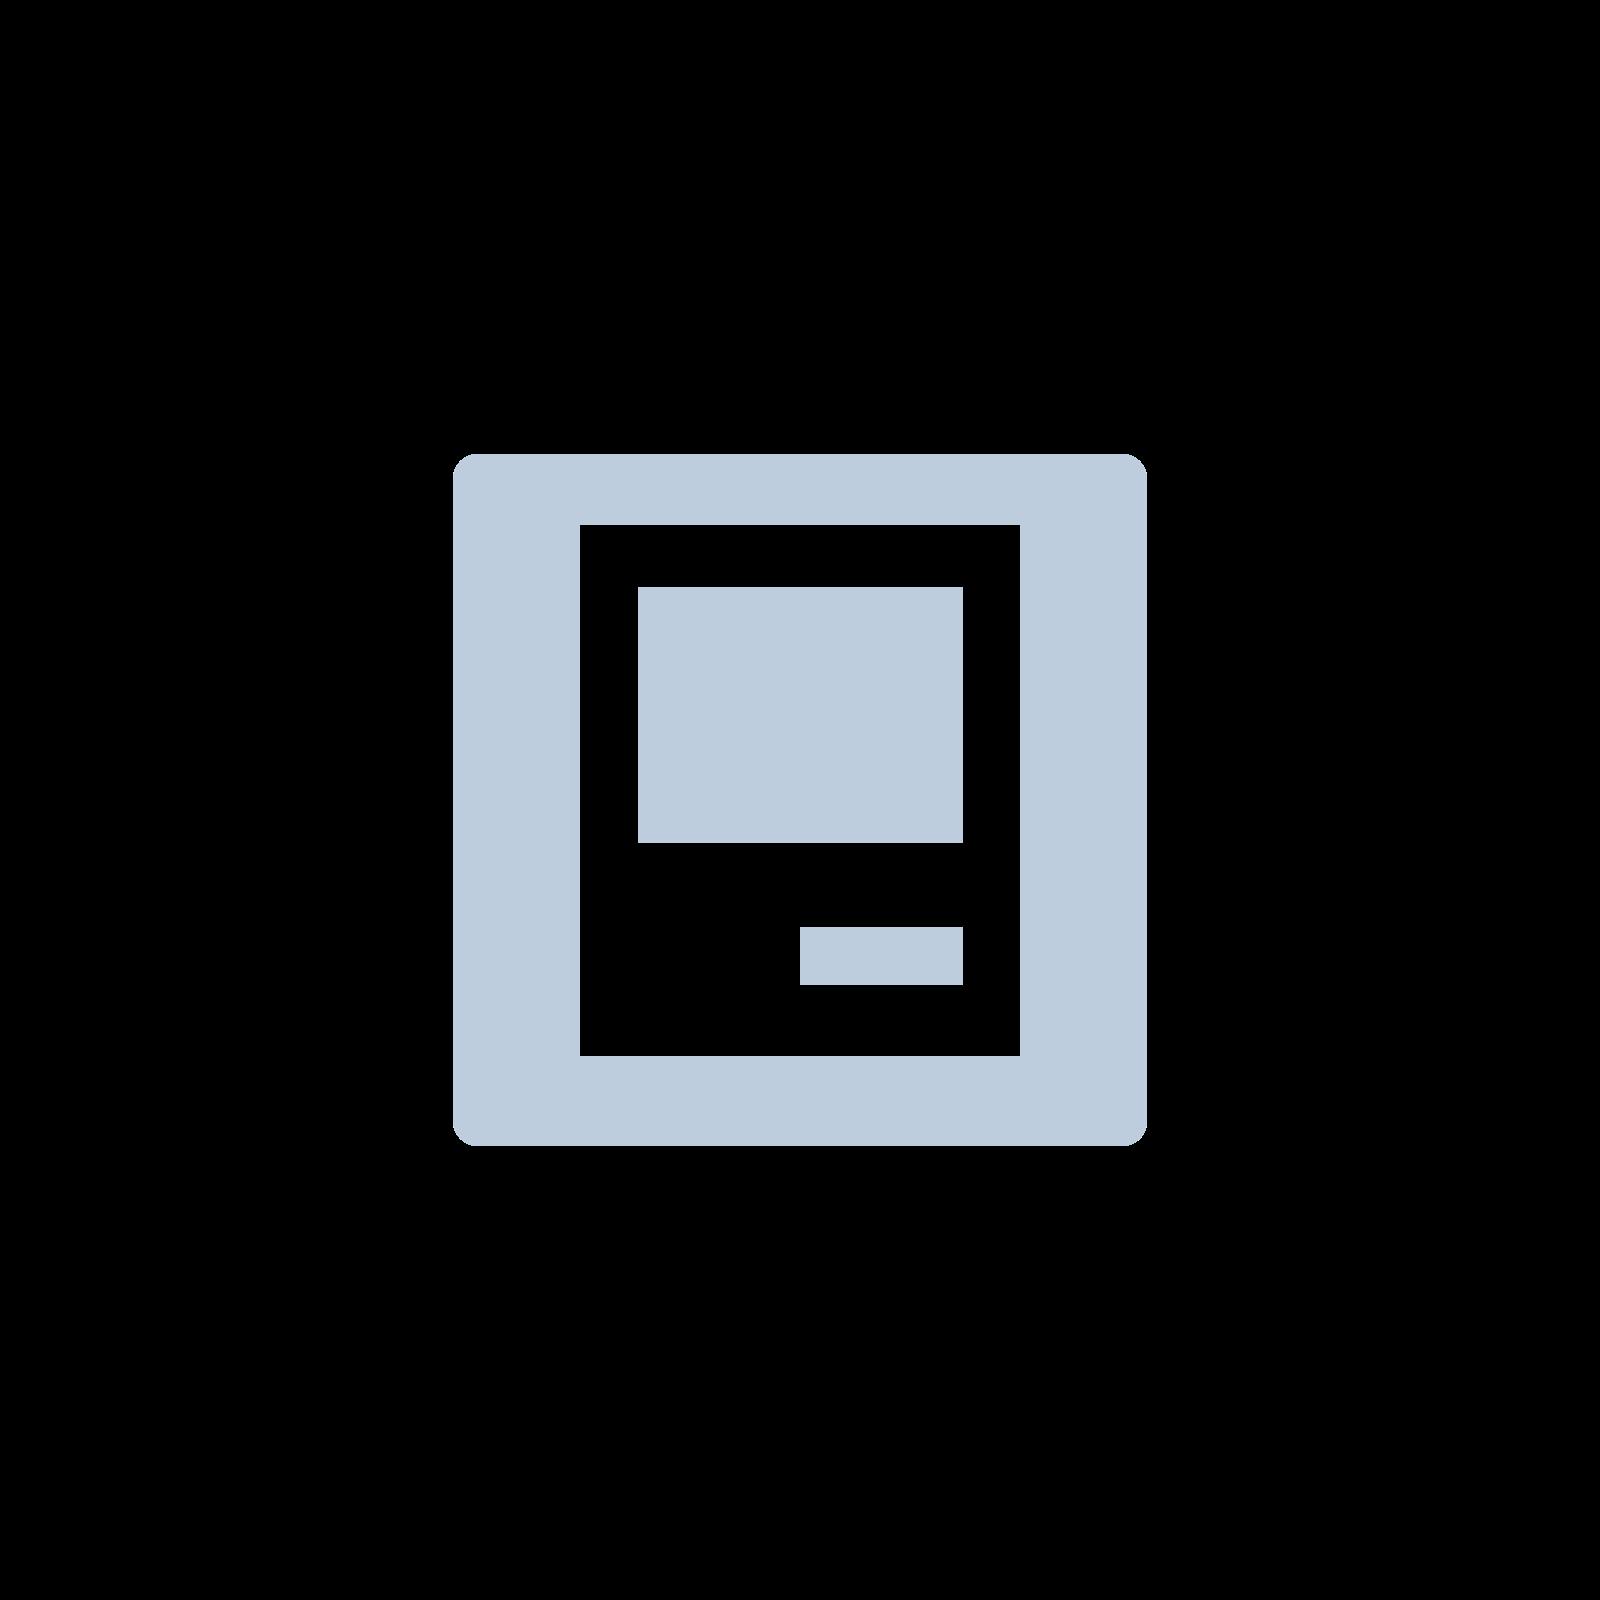 Mac mini Core 2 Duo 2.0 GHz (Macmini2,1, 120GB, 1GB)